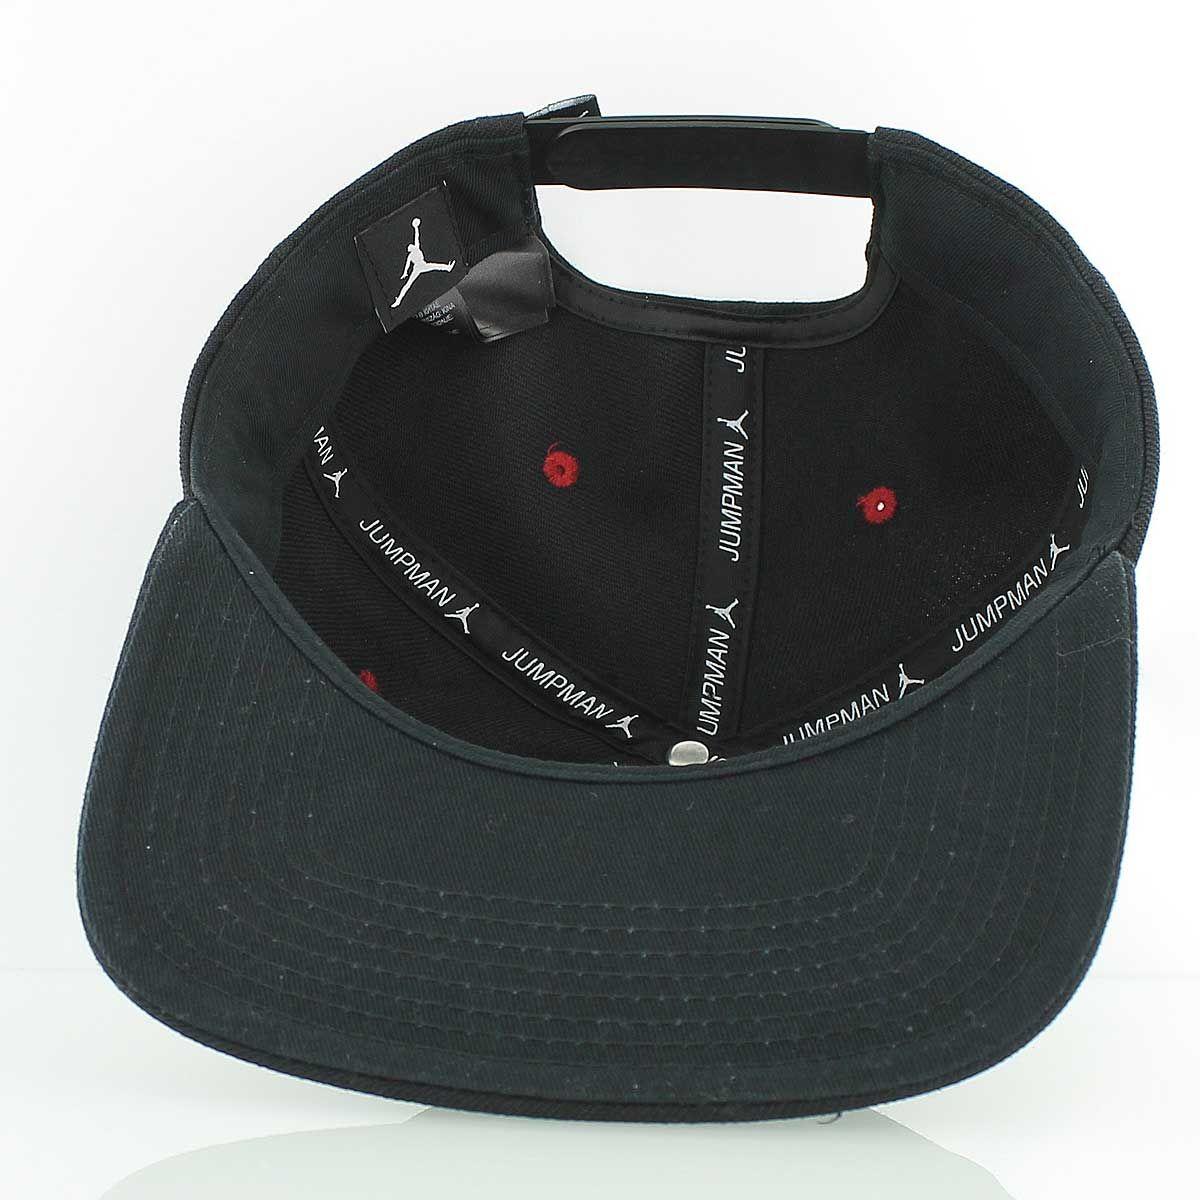 67c33dce610 JORDAN JUMPMAN Snapback Cap BLACK GYM RED